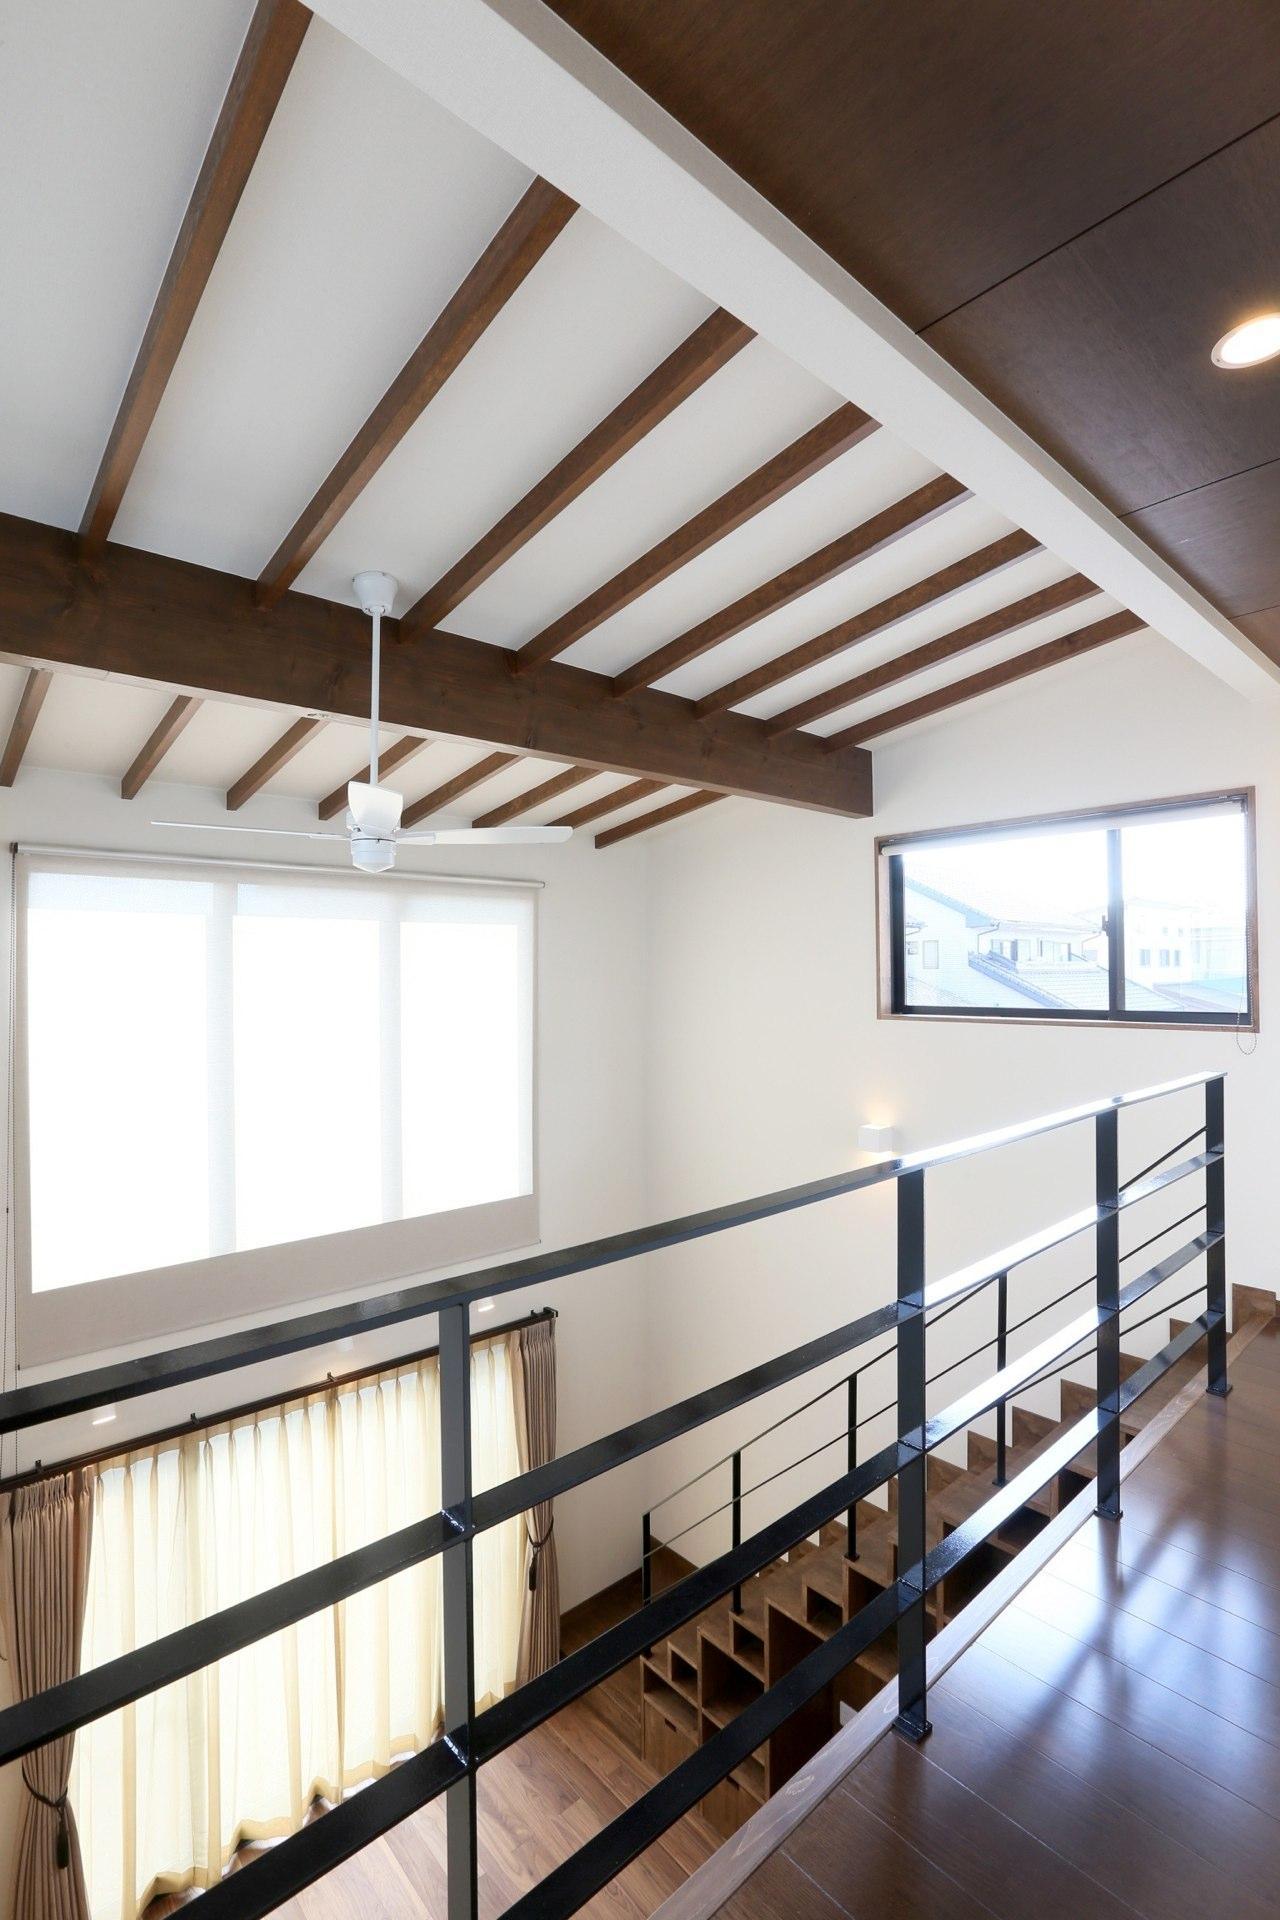 K's residenceの部屋 明るい吹き抜け空間